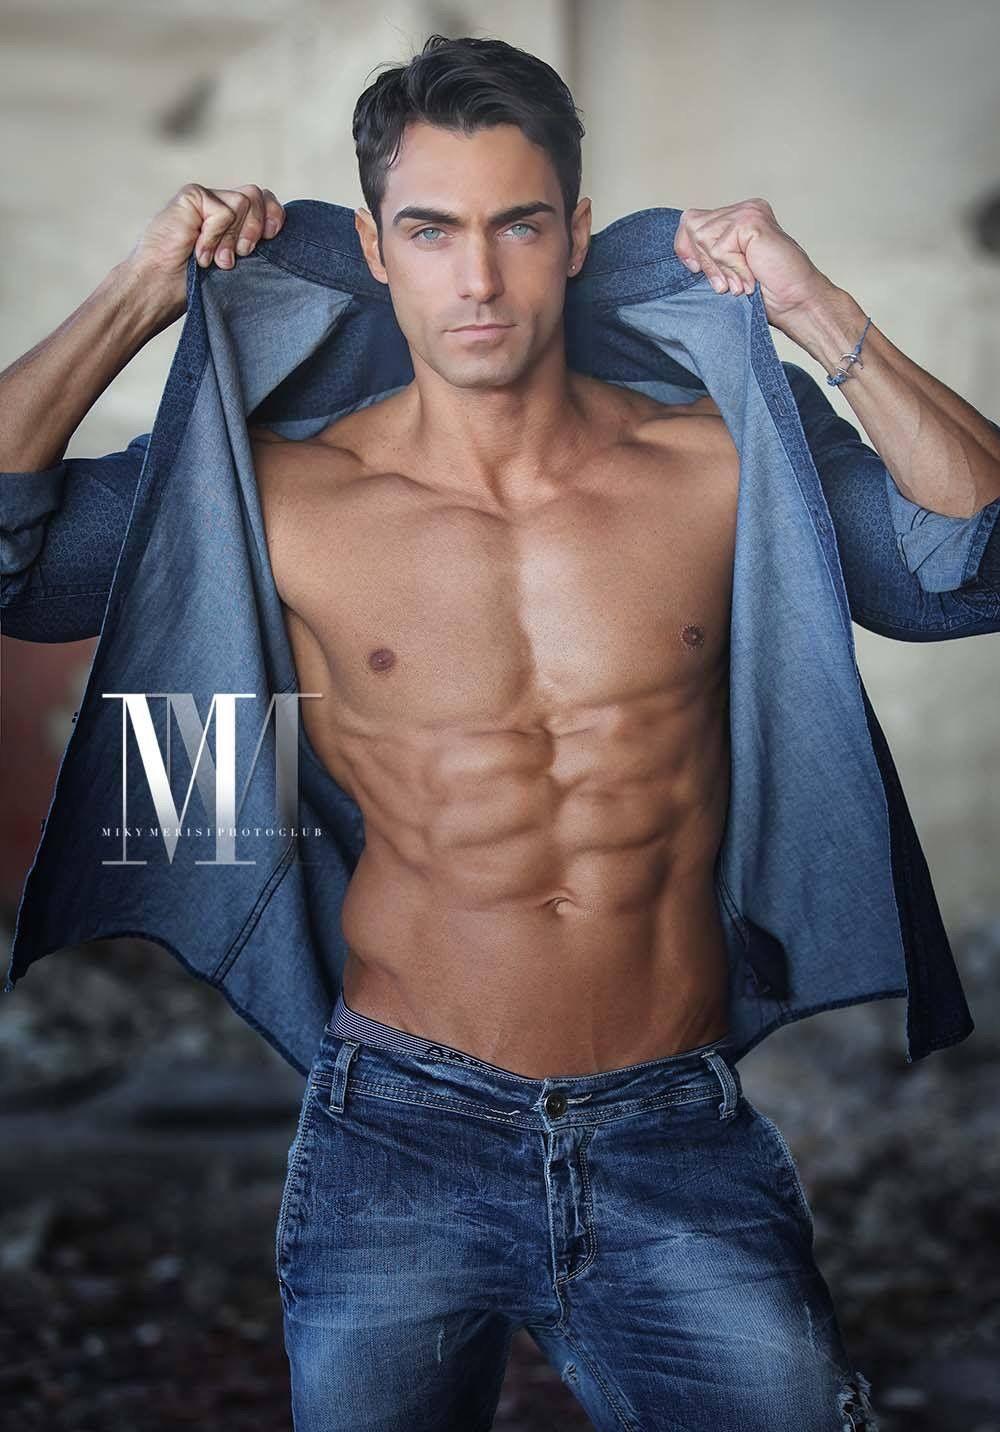 pinmorris fowler on miky merisi photo club   pinterest   male models